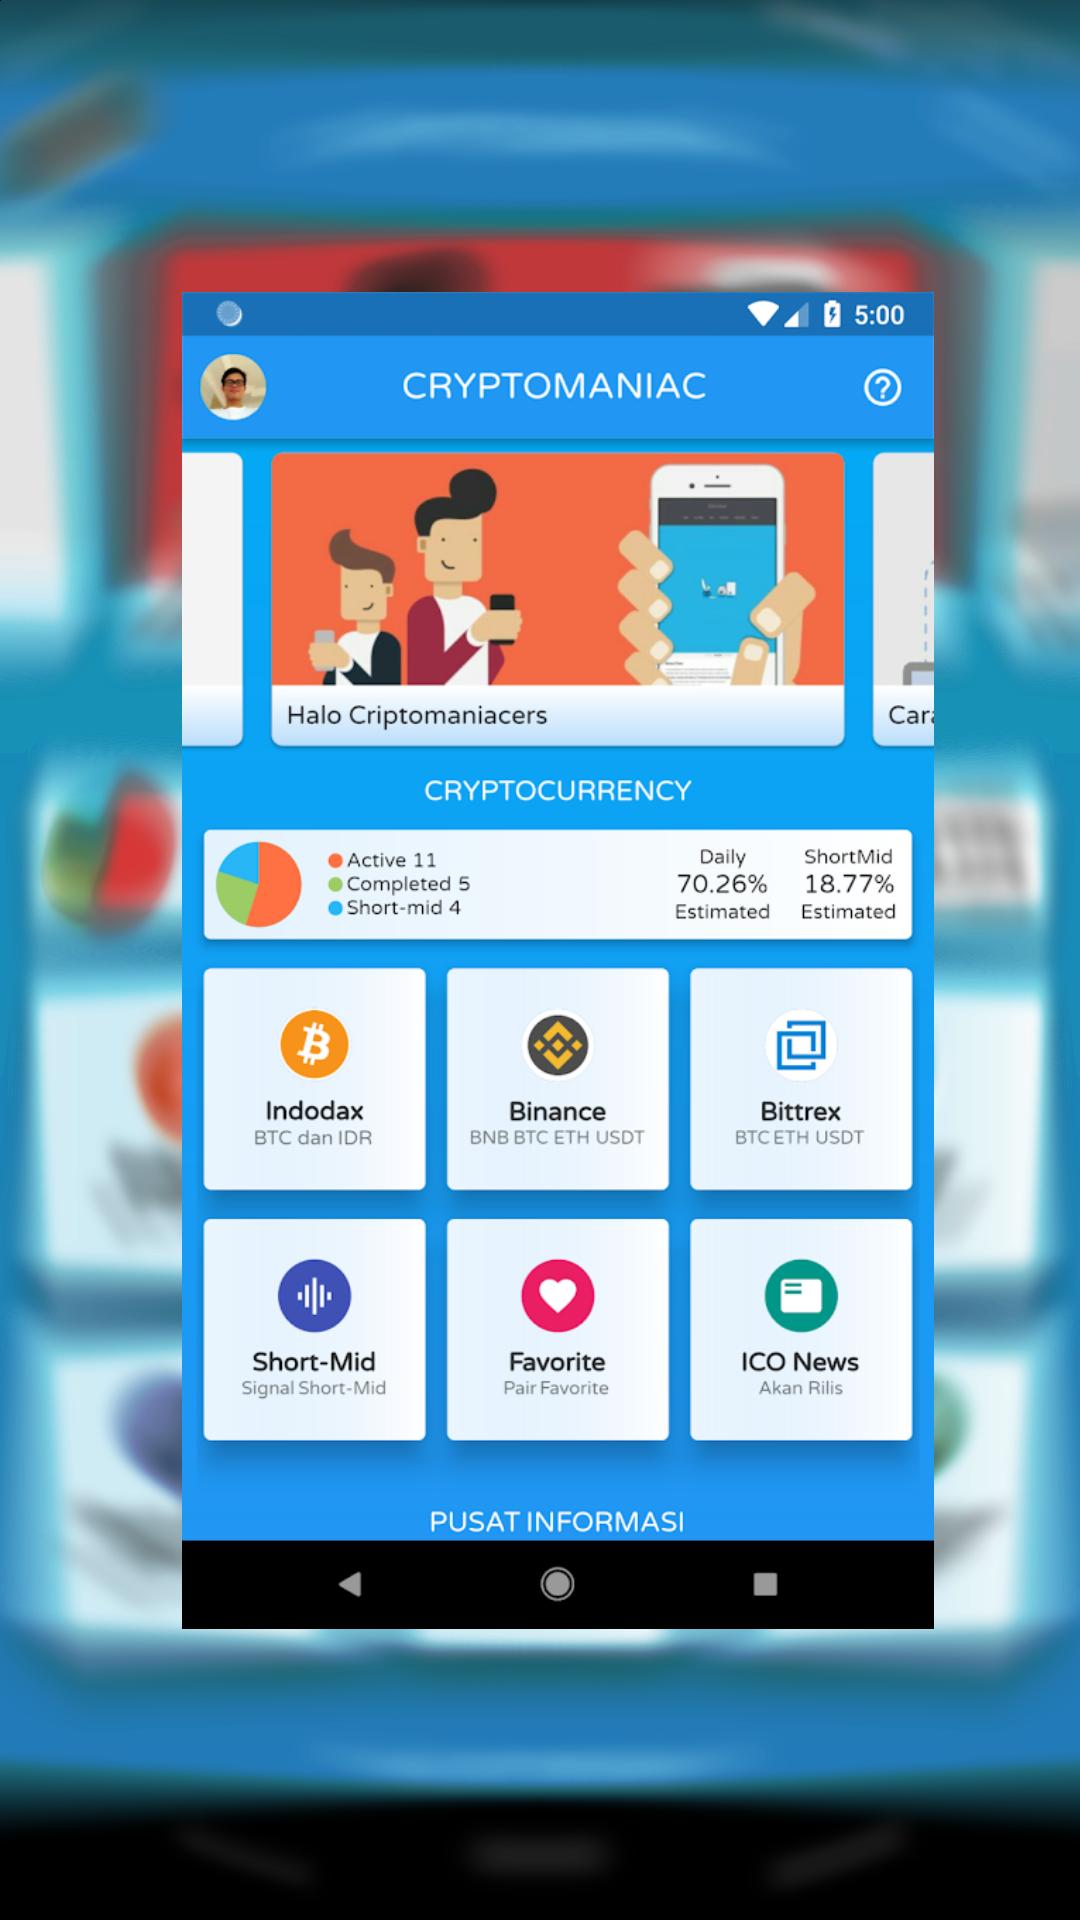 Cryptomaniac Pro | It's All Widgets!